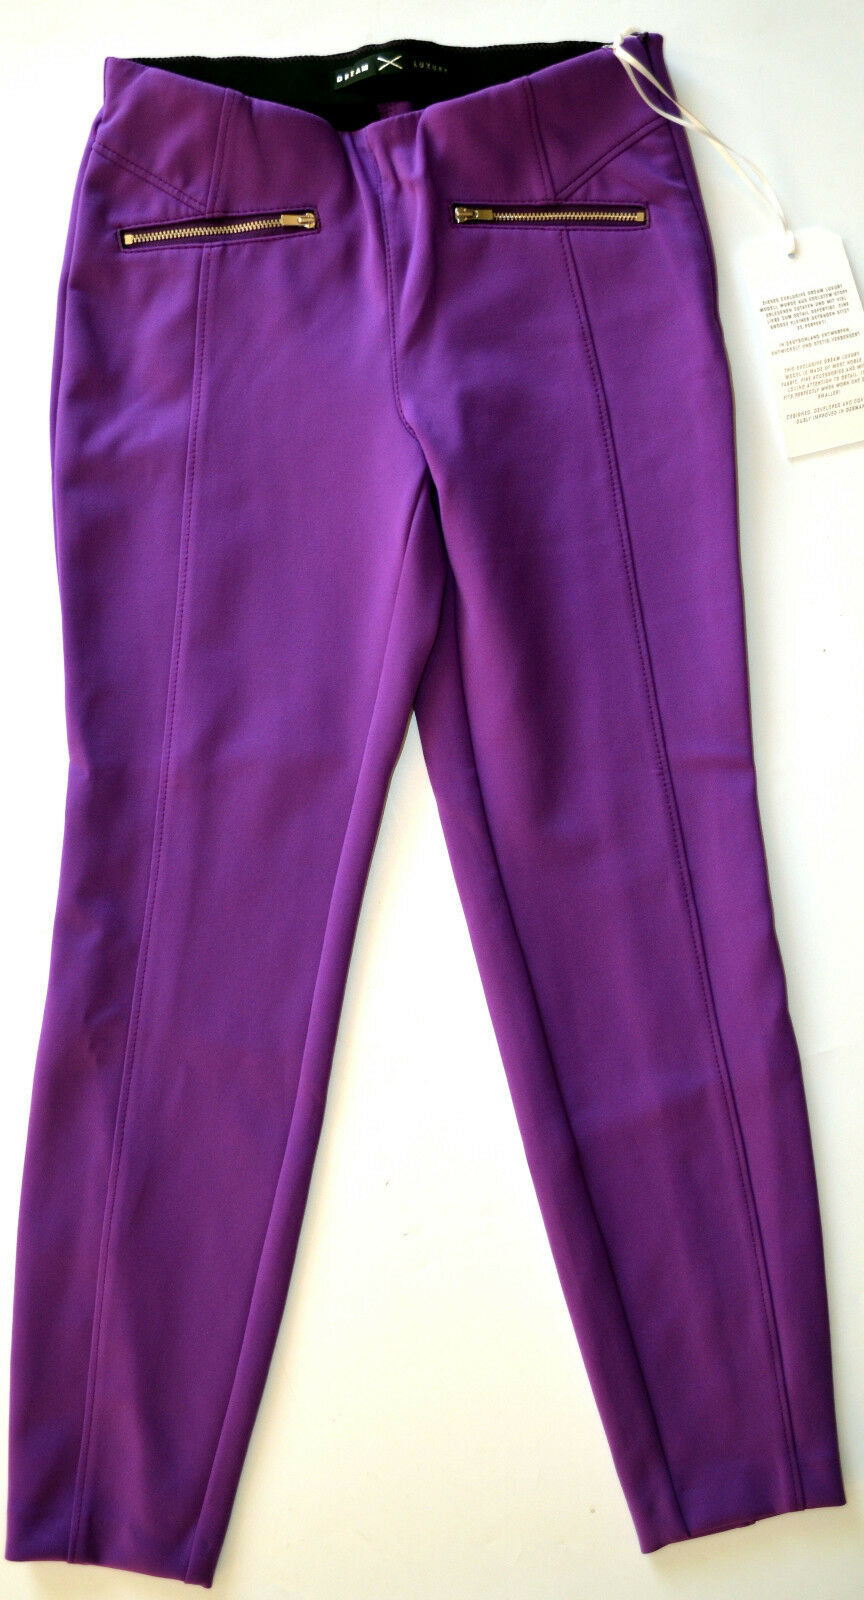 Mac Jeans Dream Ankle Luxury Skinny Stretch Tube lila Größe 34 L 27 NEW